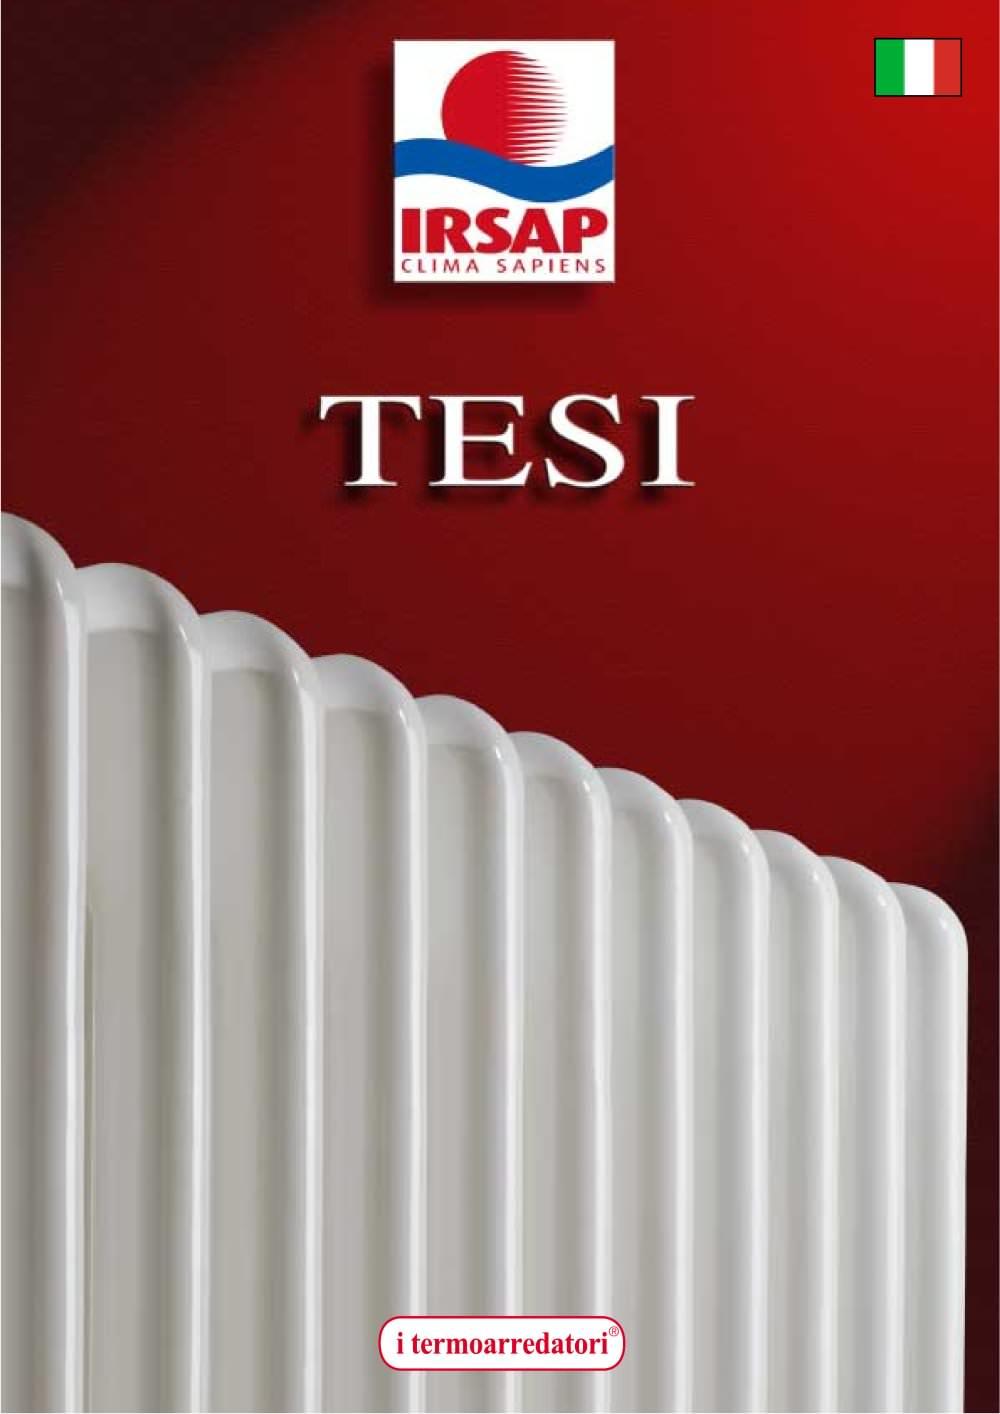 TESI - IRSAP - Catálogo PDF | Documentación | Brochure